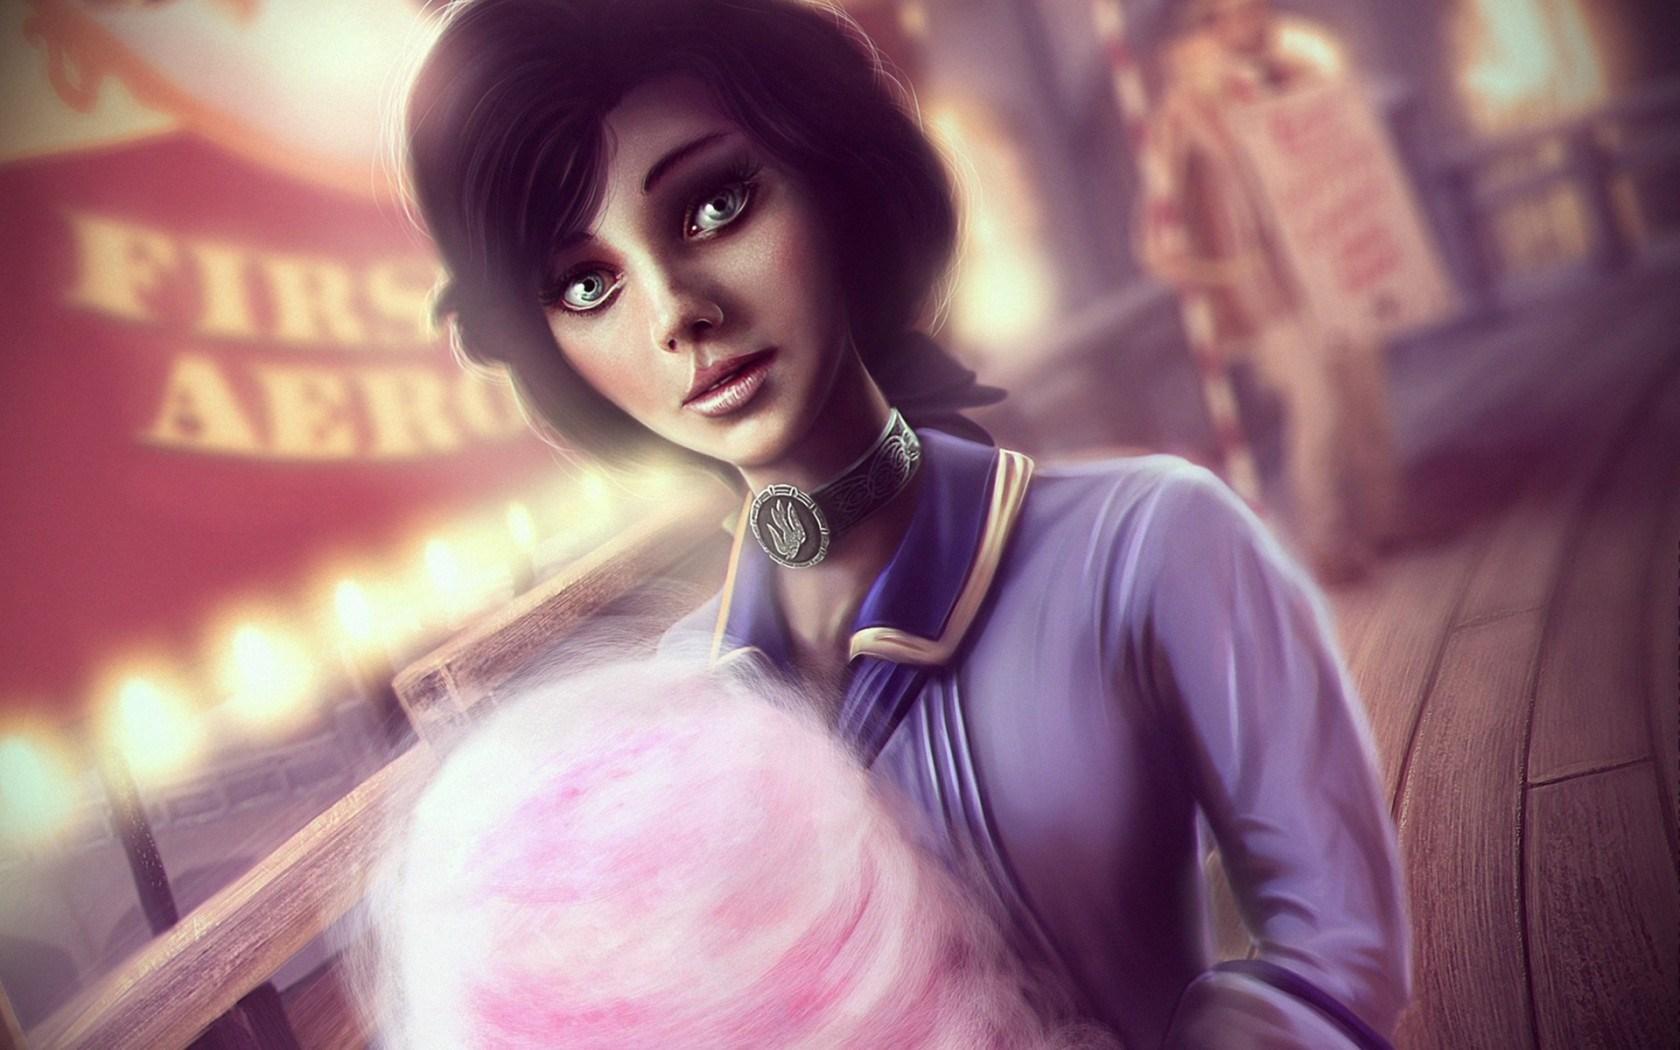 Art BioShock Girl Game